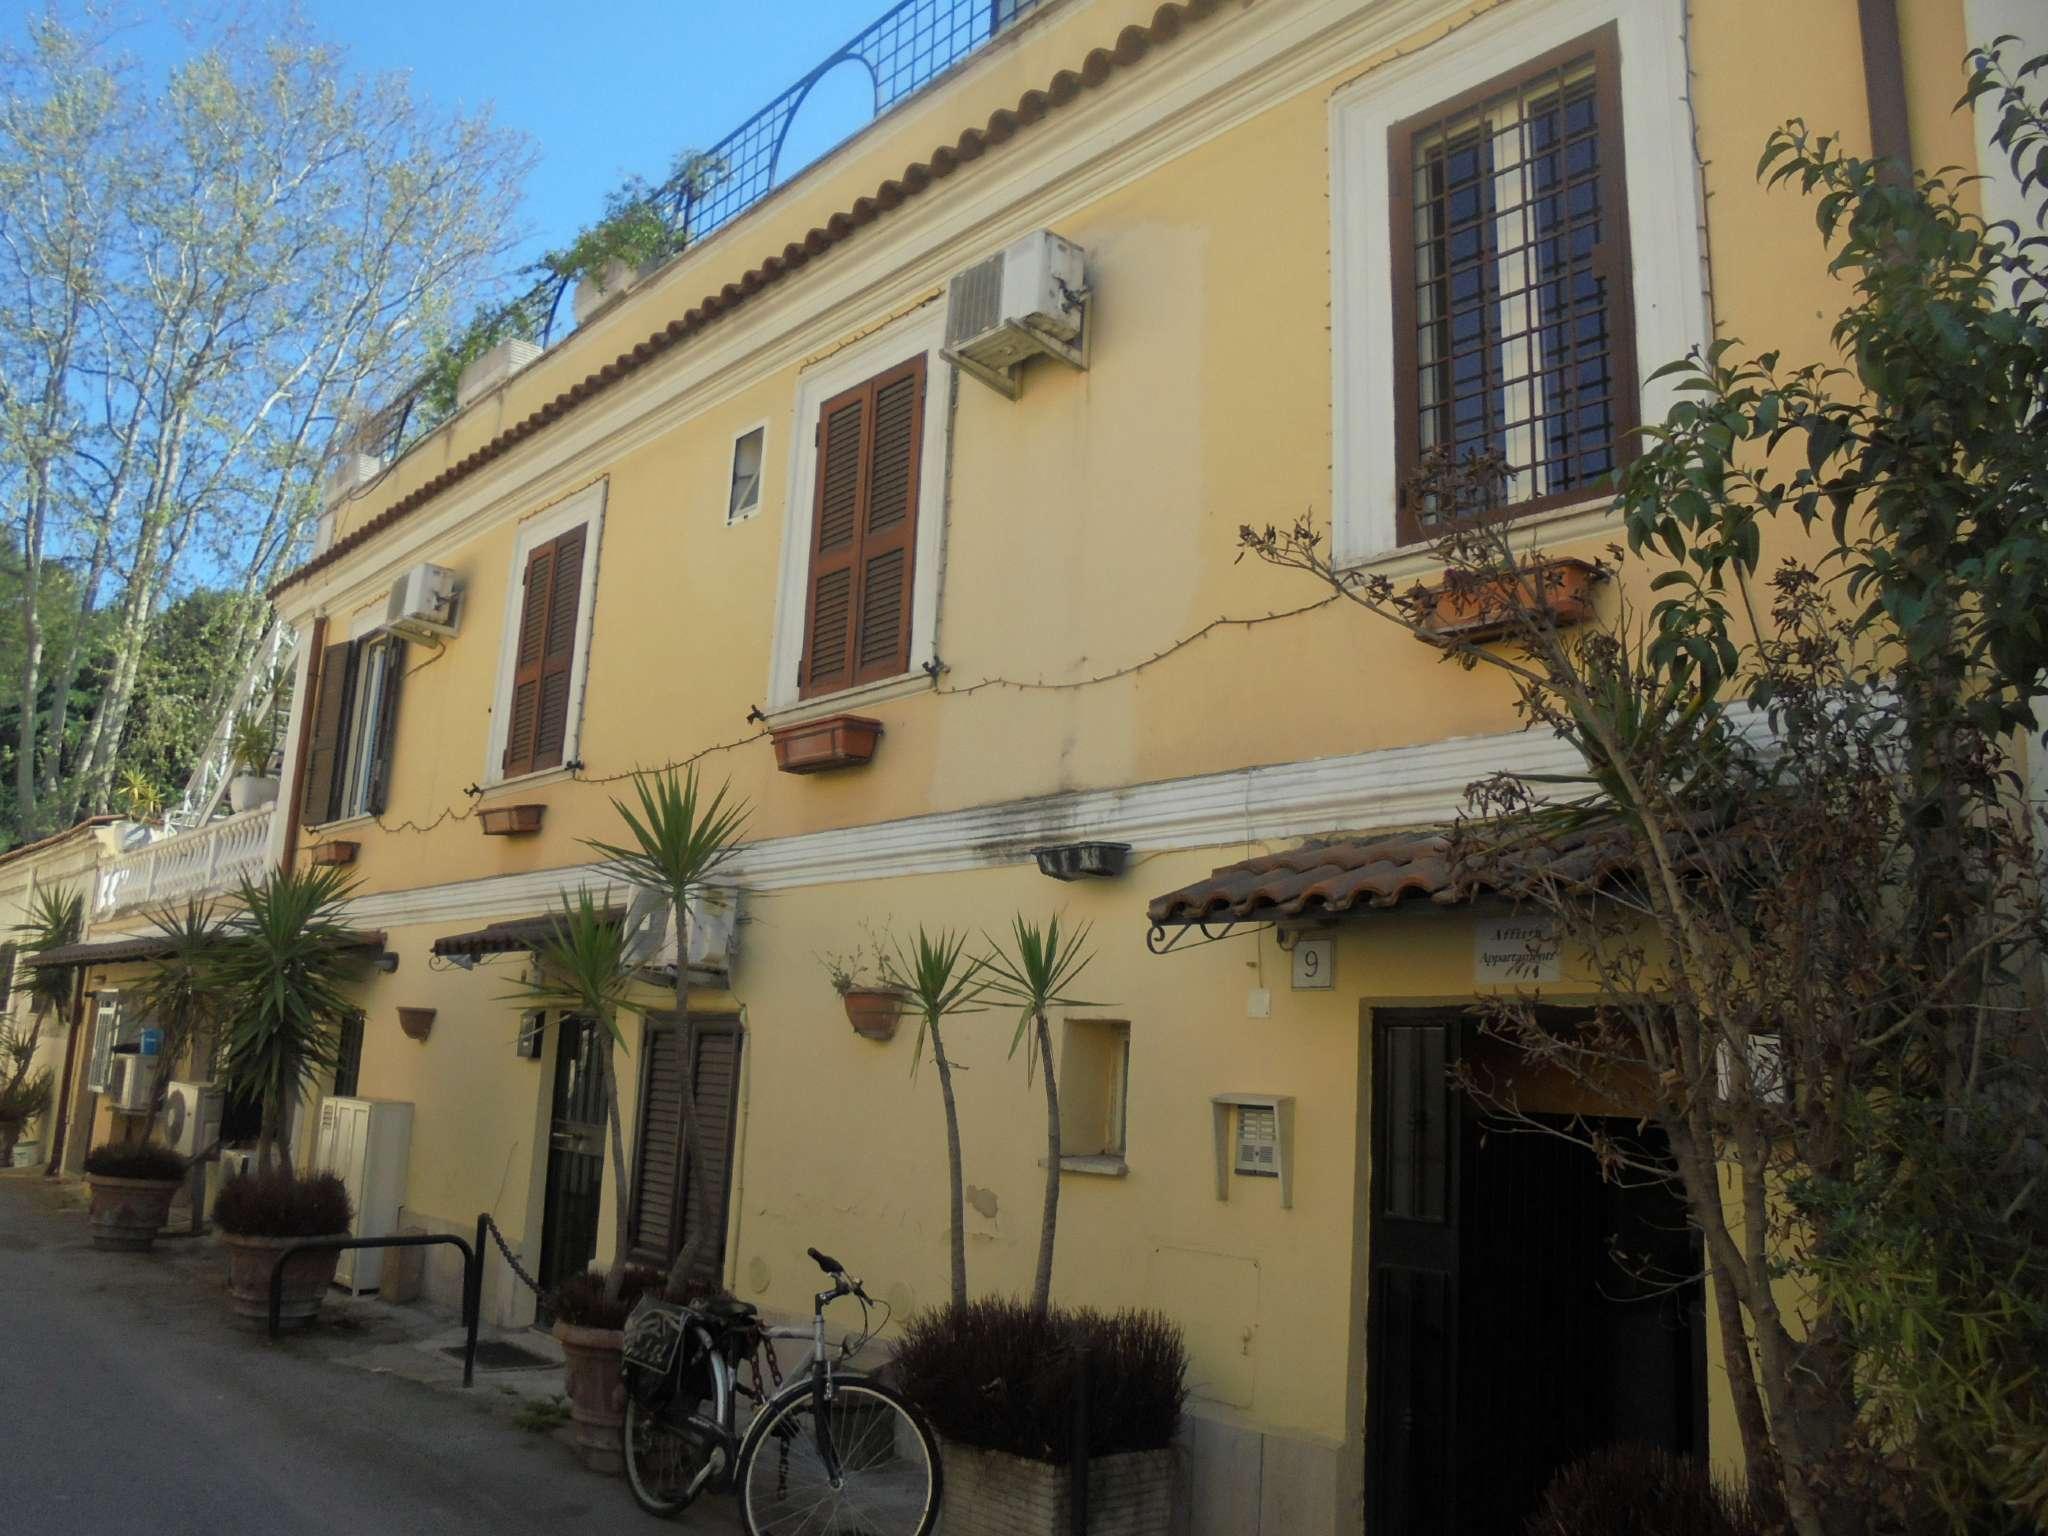 Appartamento, via tiburtina, Nomentano - Bologna, Vacanze - Roma